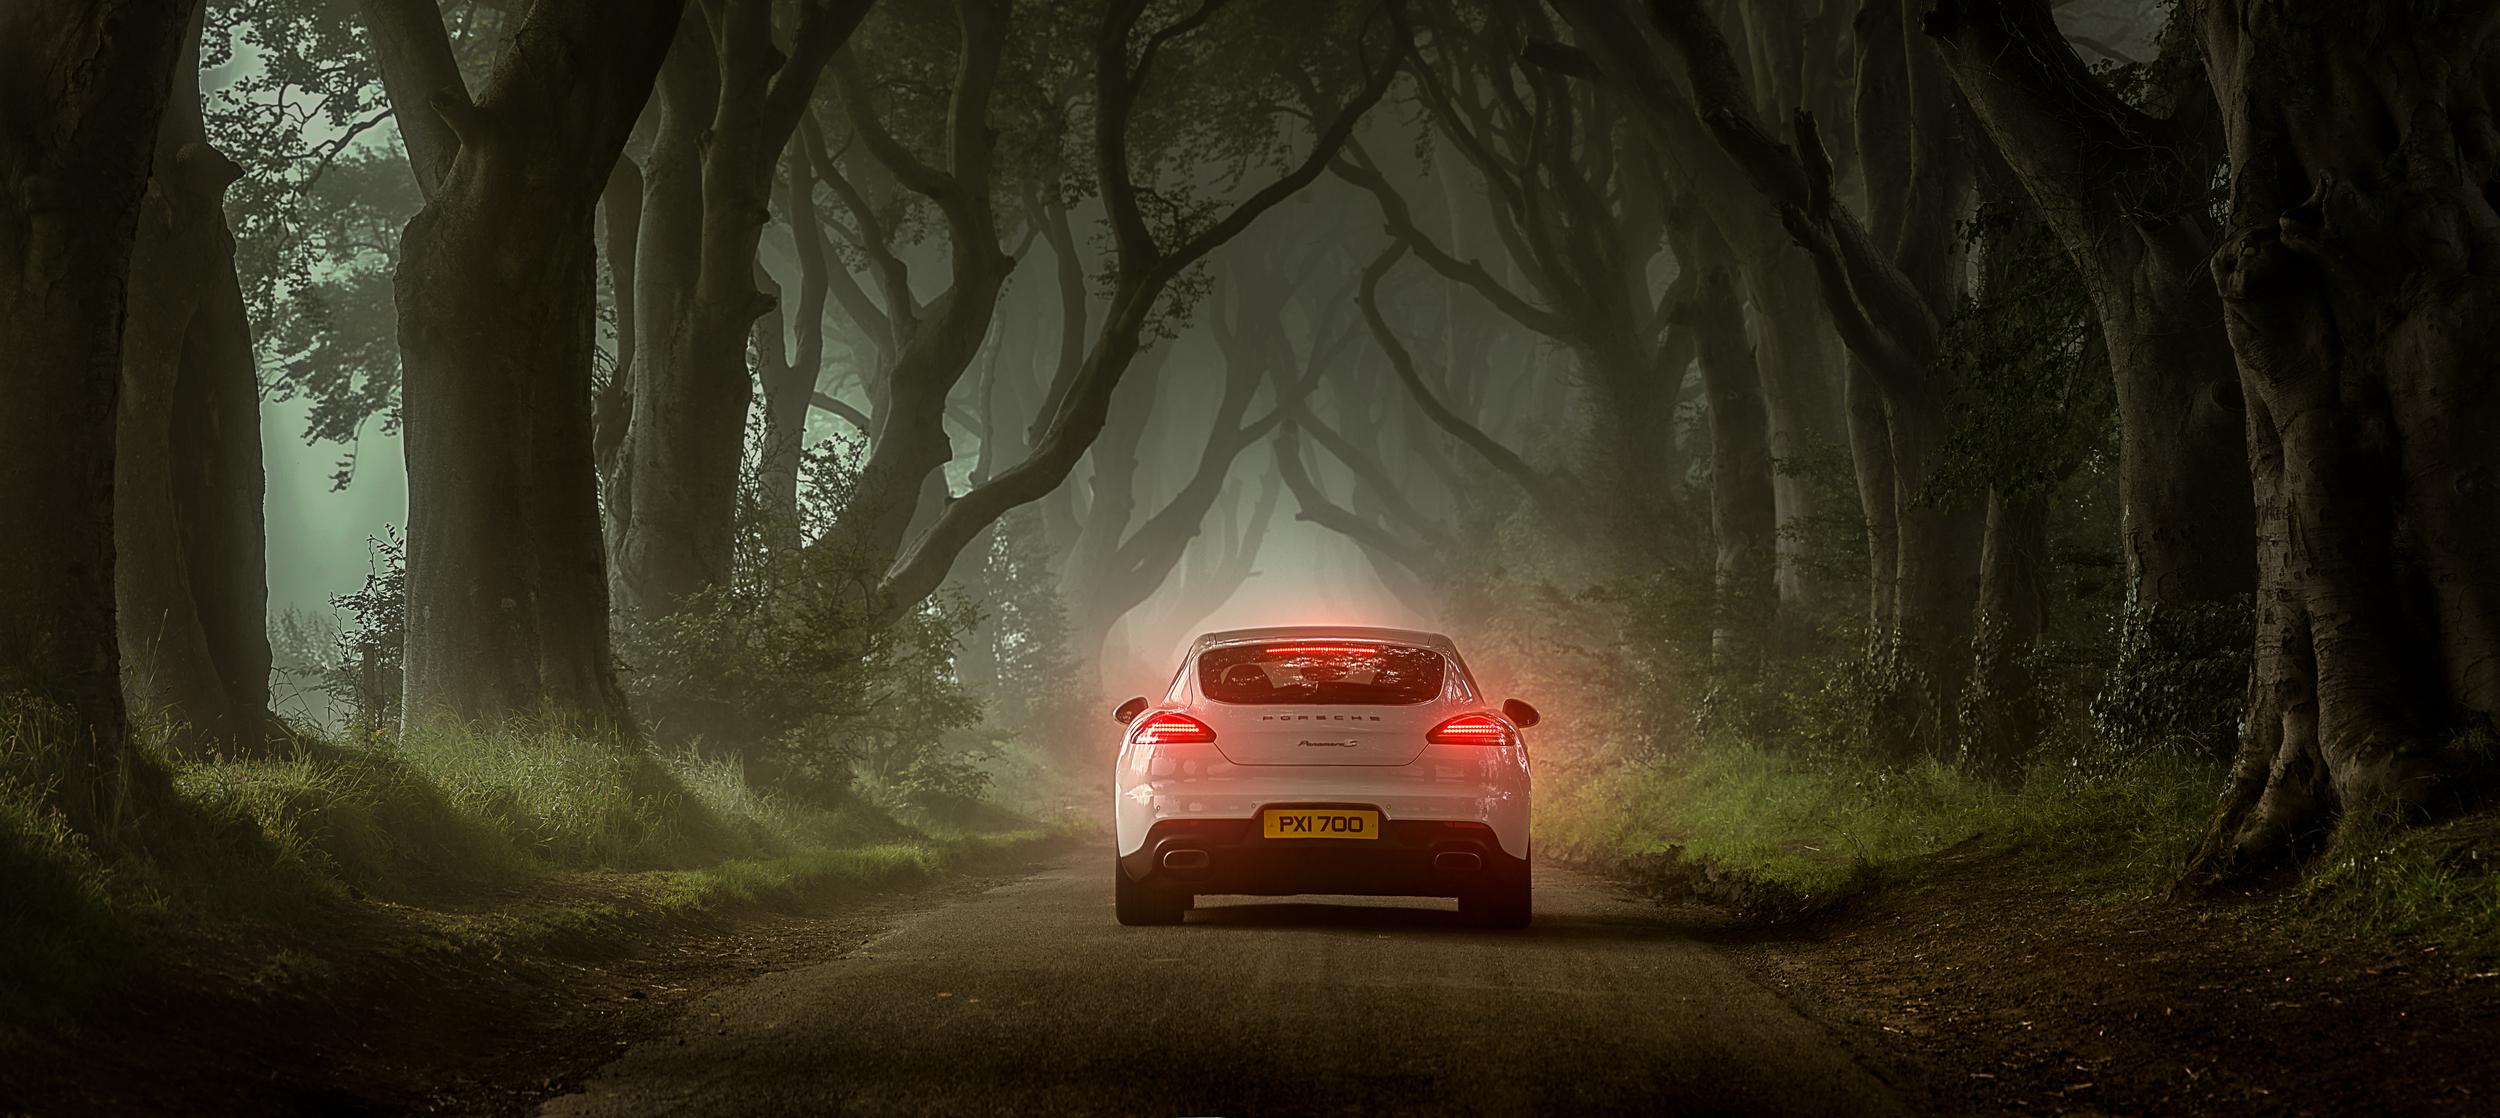 Porsche Panamera Dark Hedges-Edit.jpg